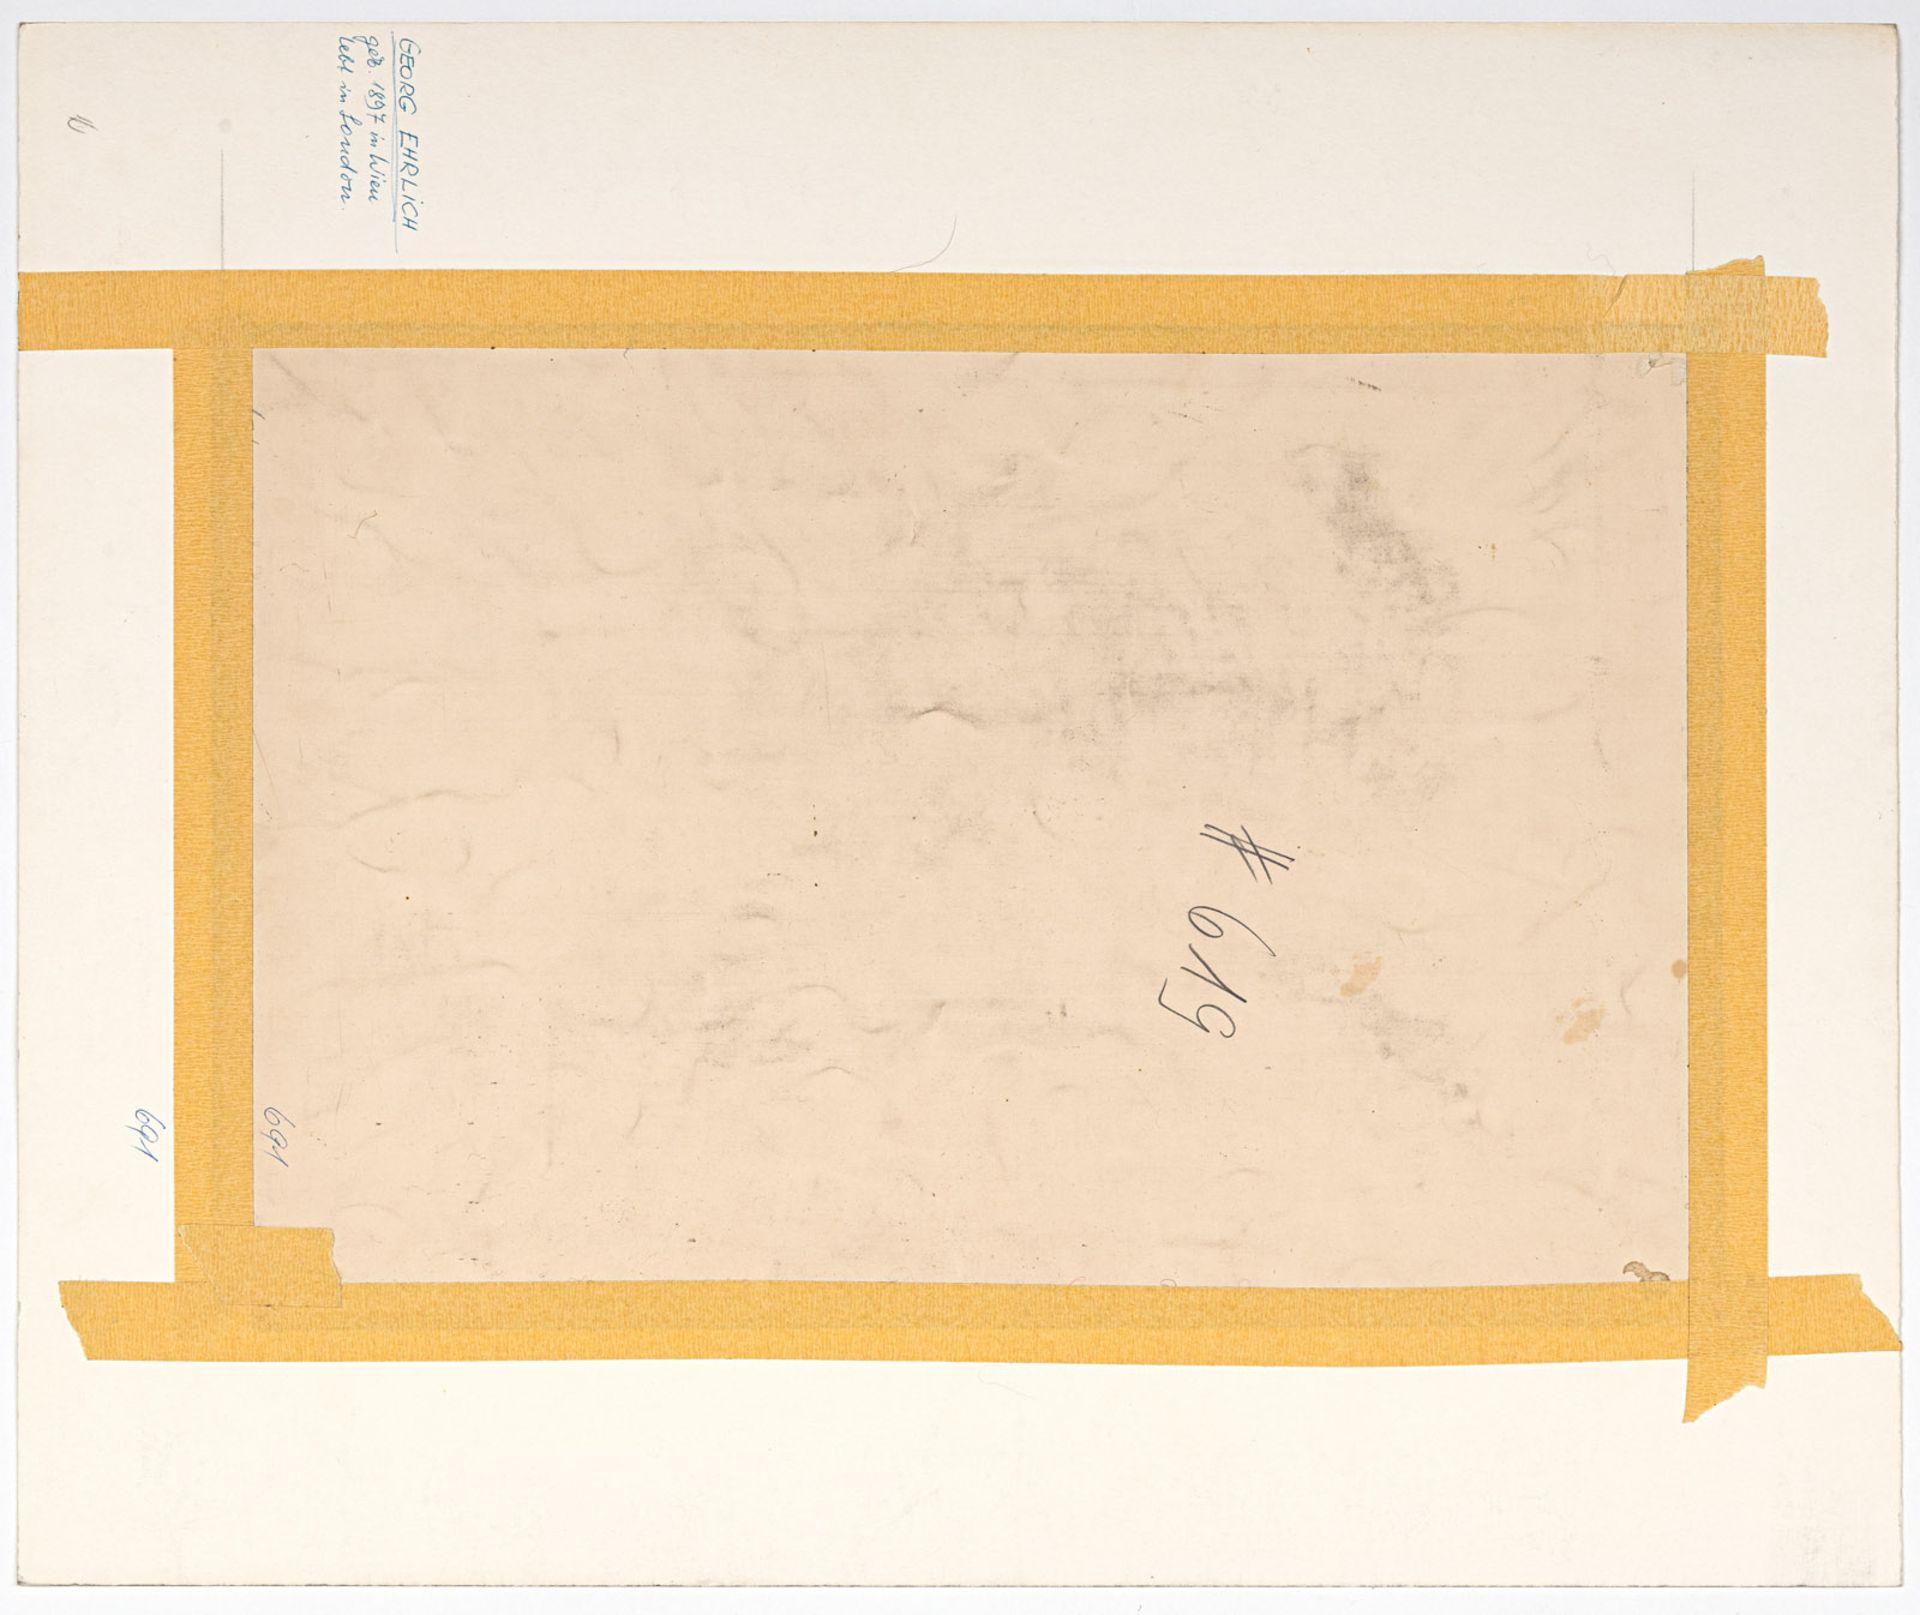 Ehrlich, Georg - Image 3 of 3